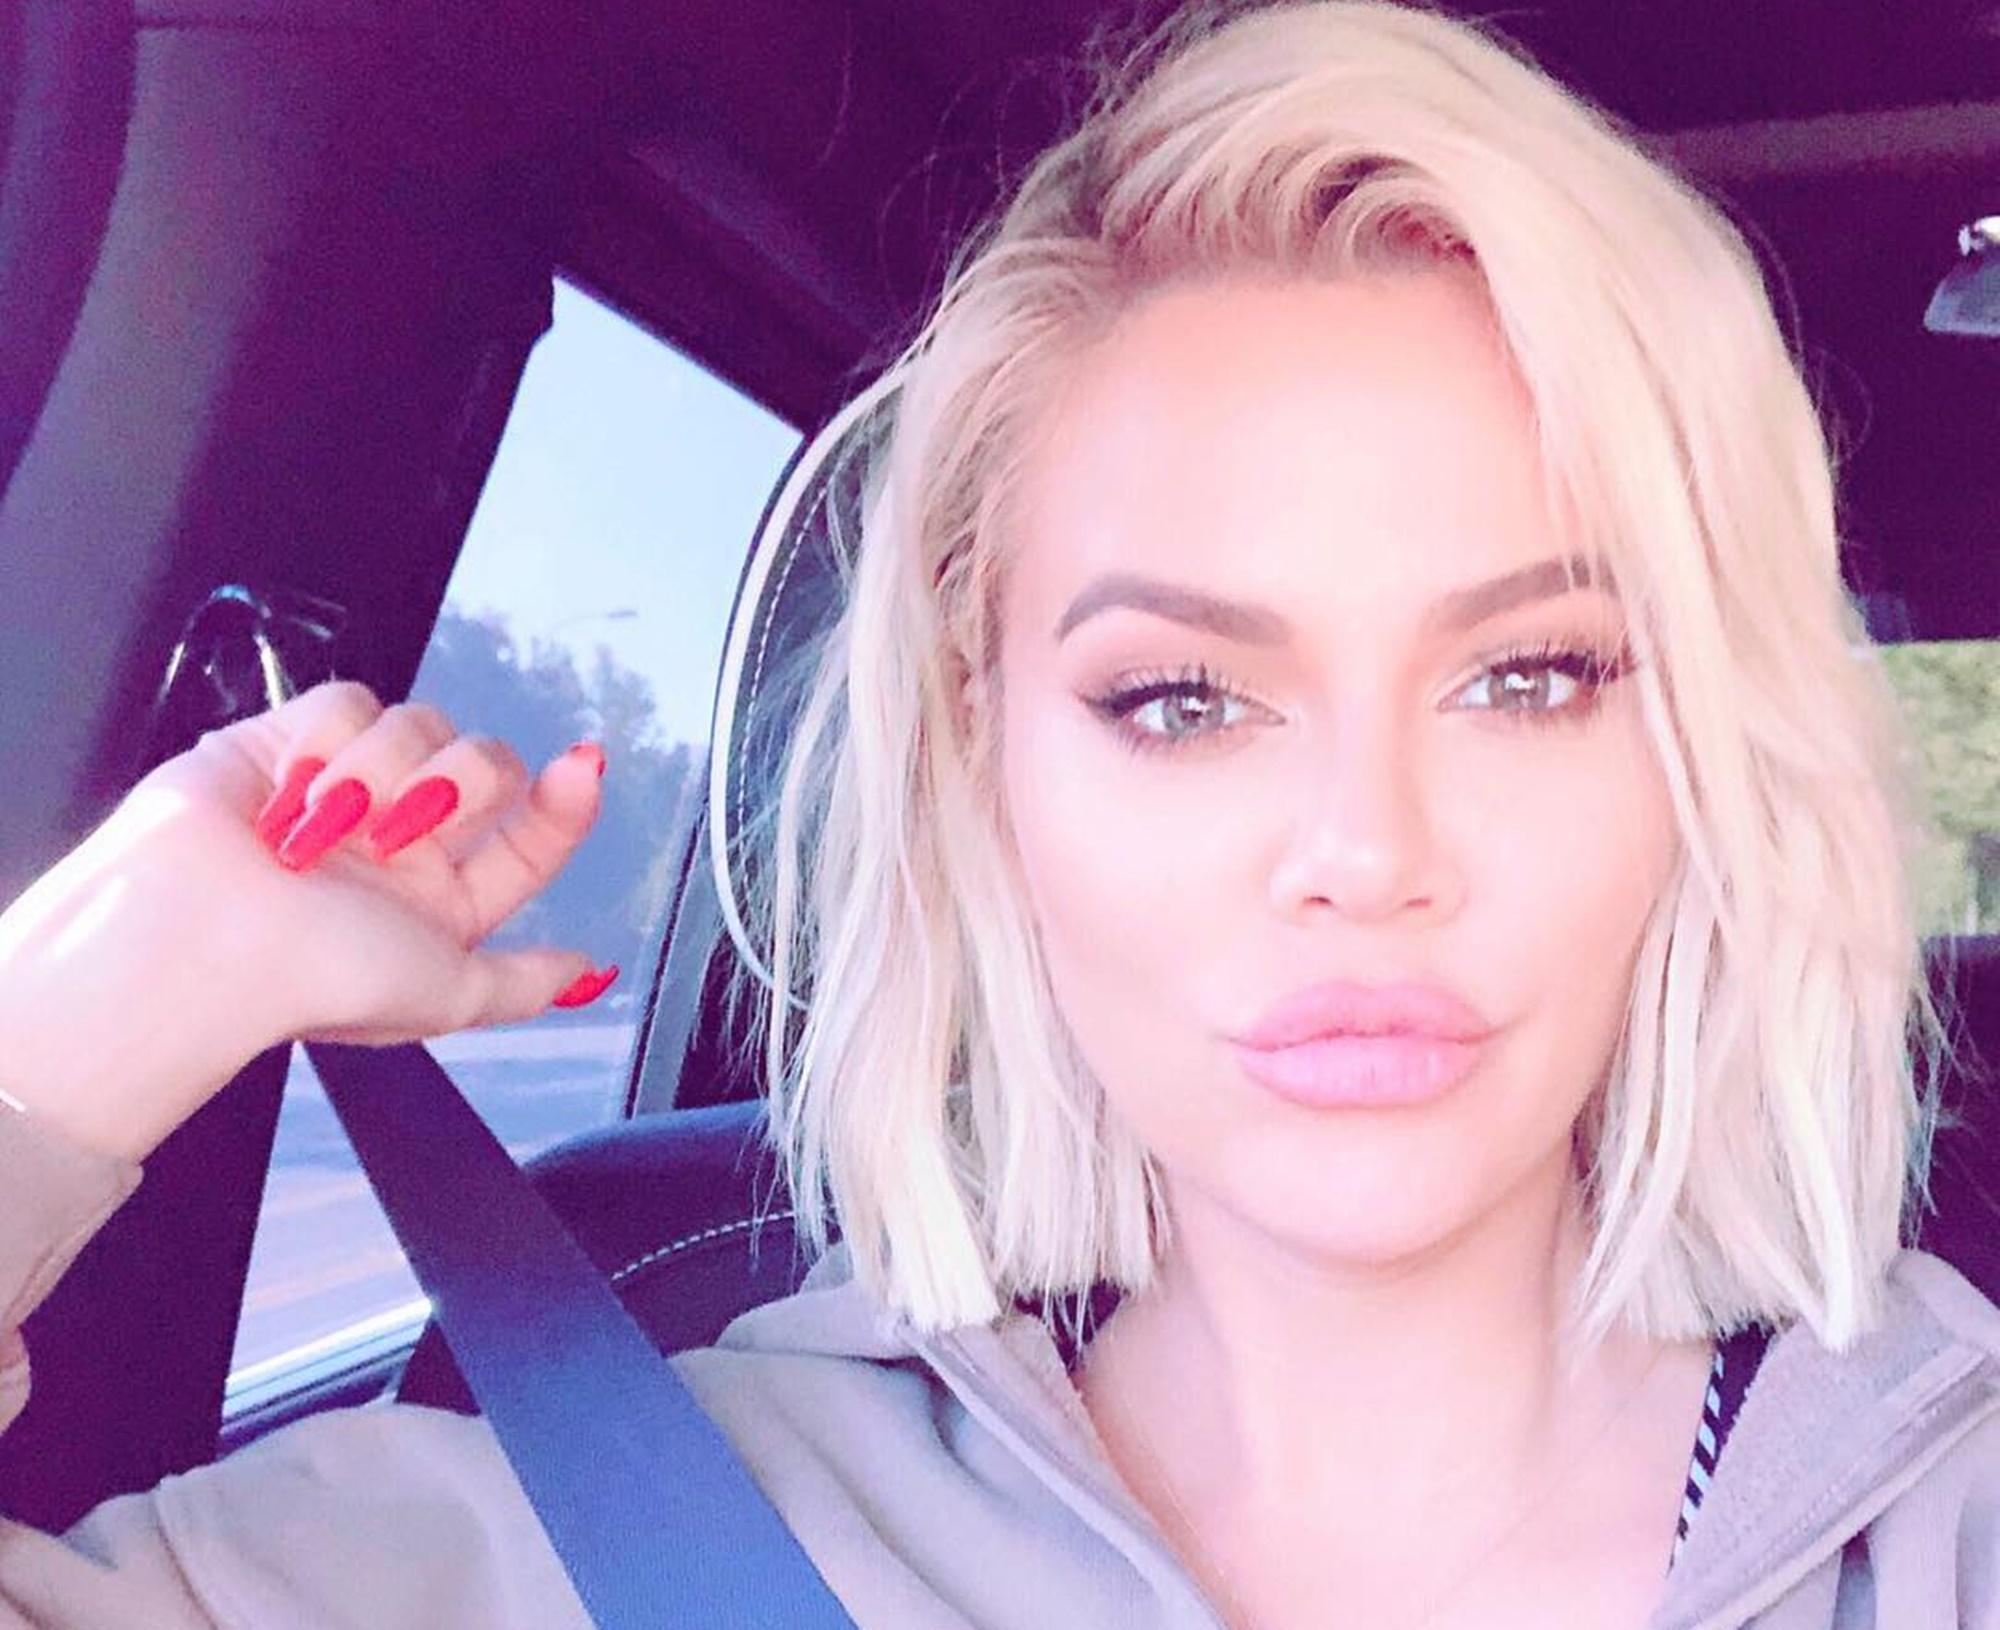 Khloe Kardashian Lip Injections True